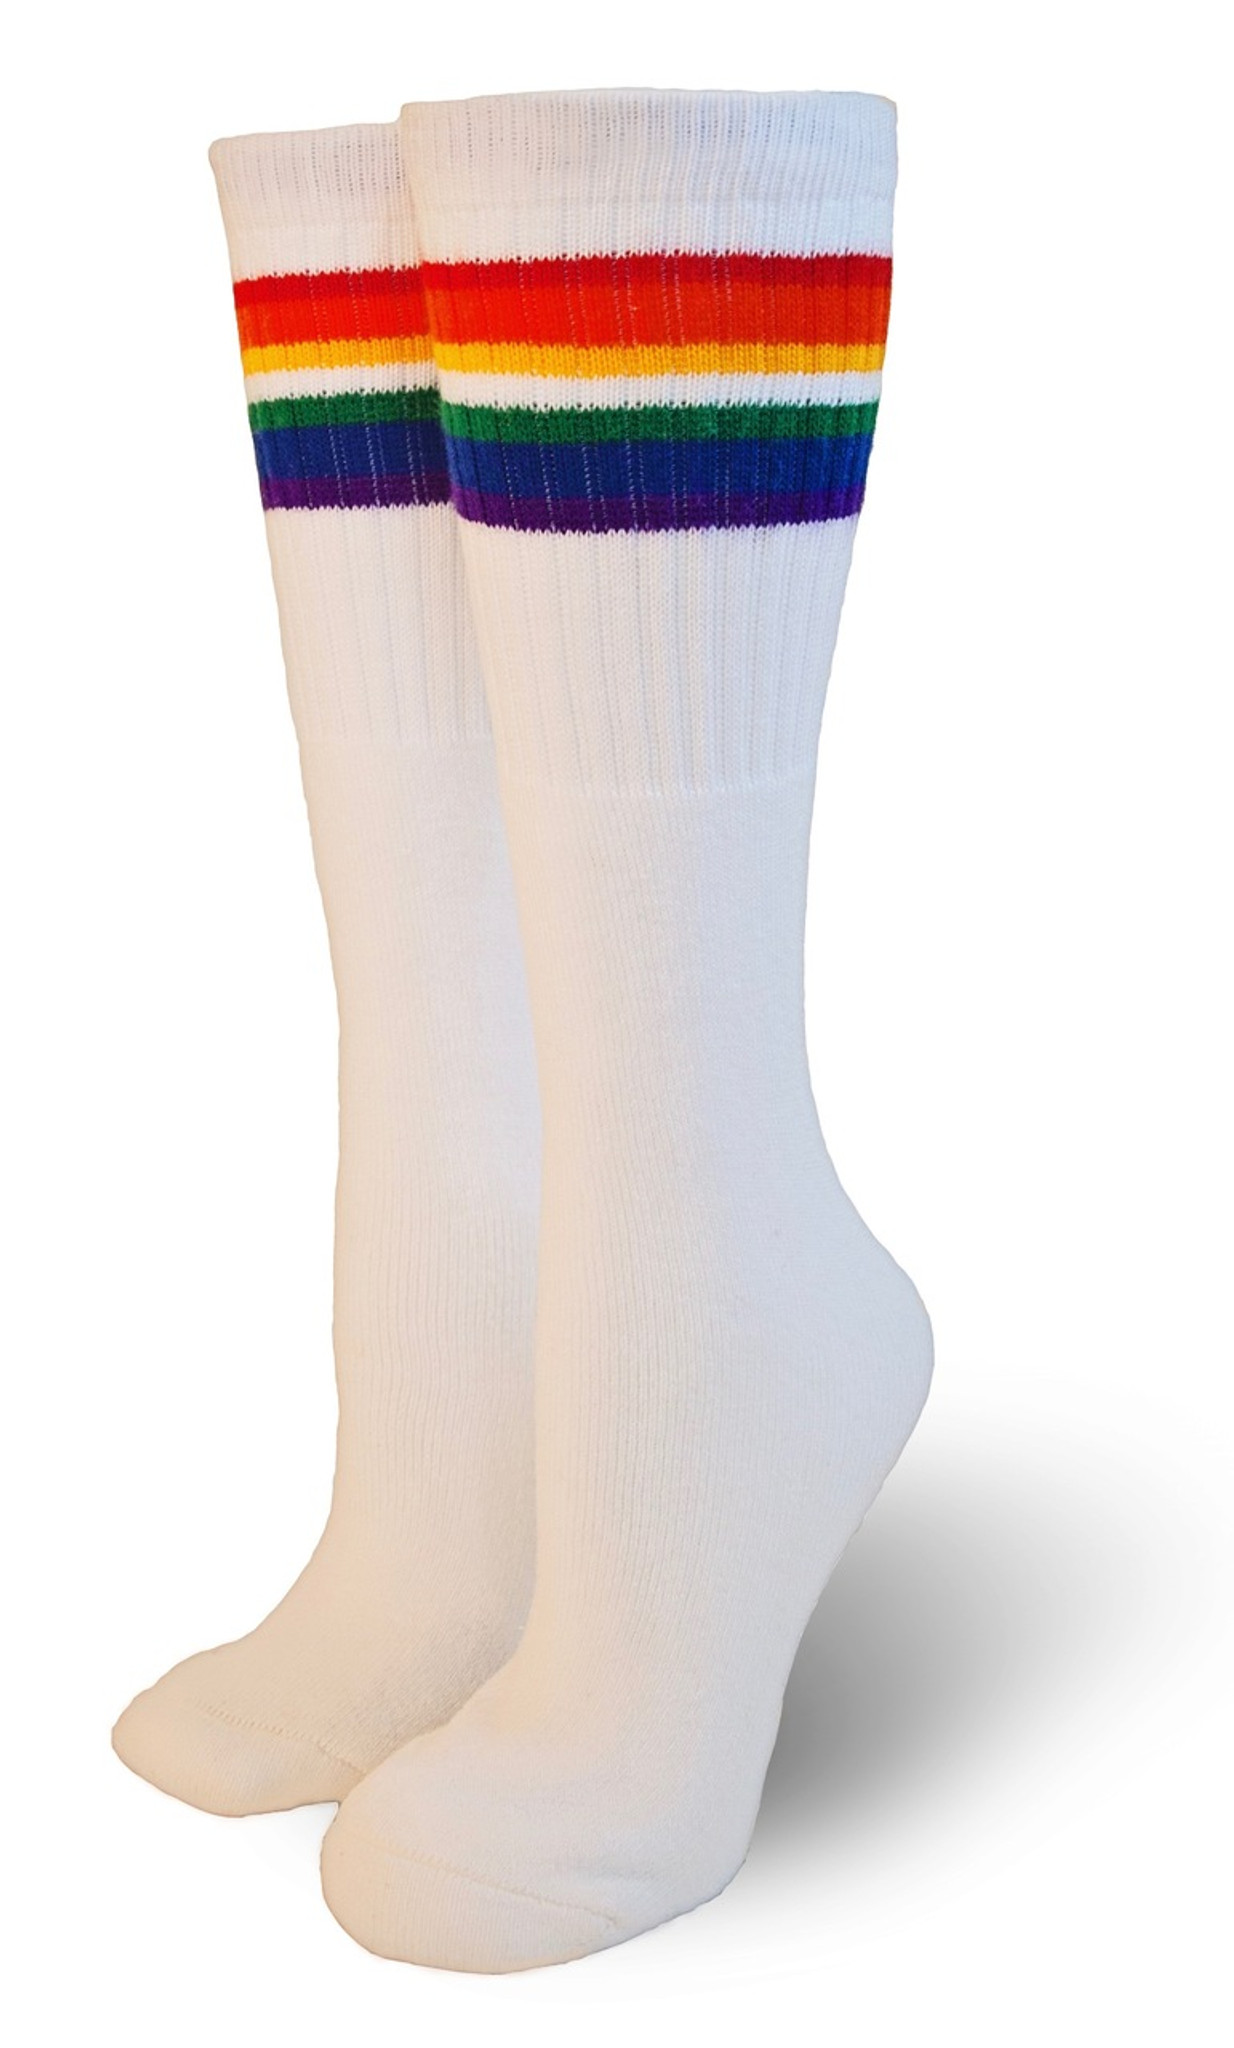 35552145fbf knee high gay lgbt rainbow pride socks